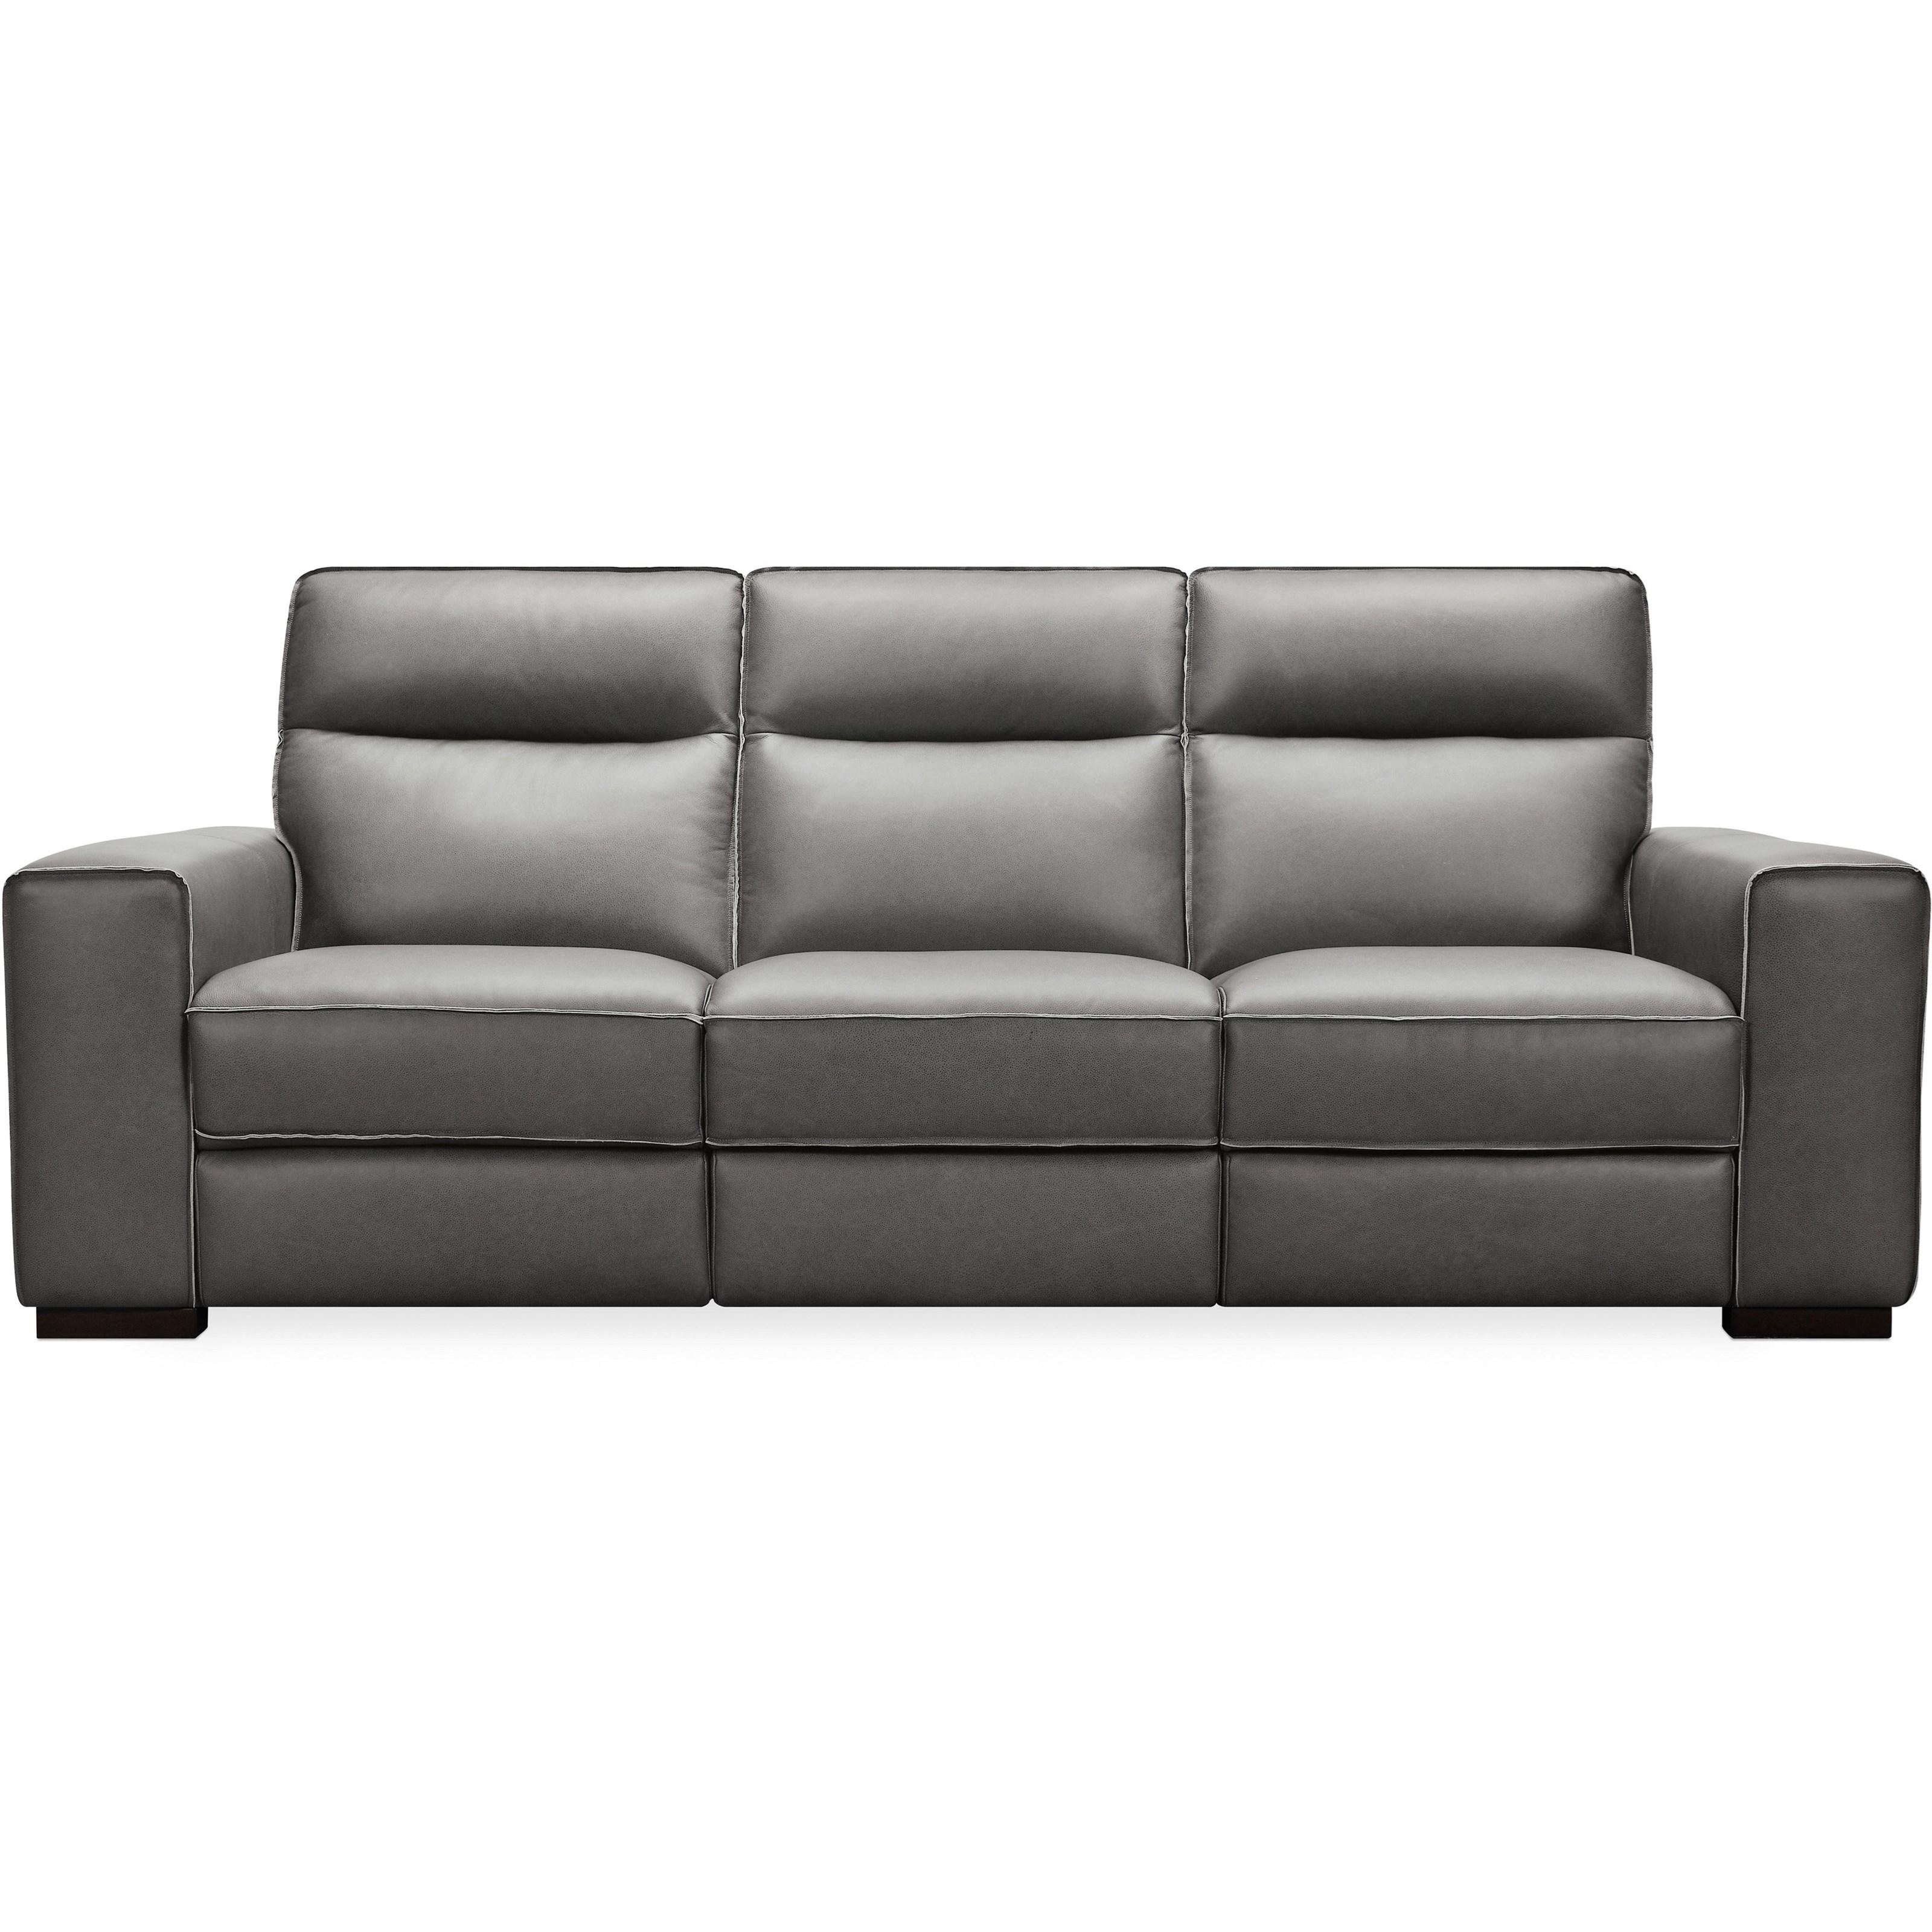 Braeburn Leather Power Reclining Sofa